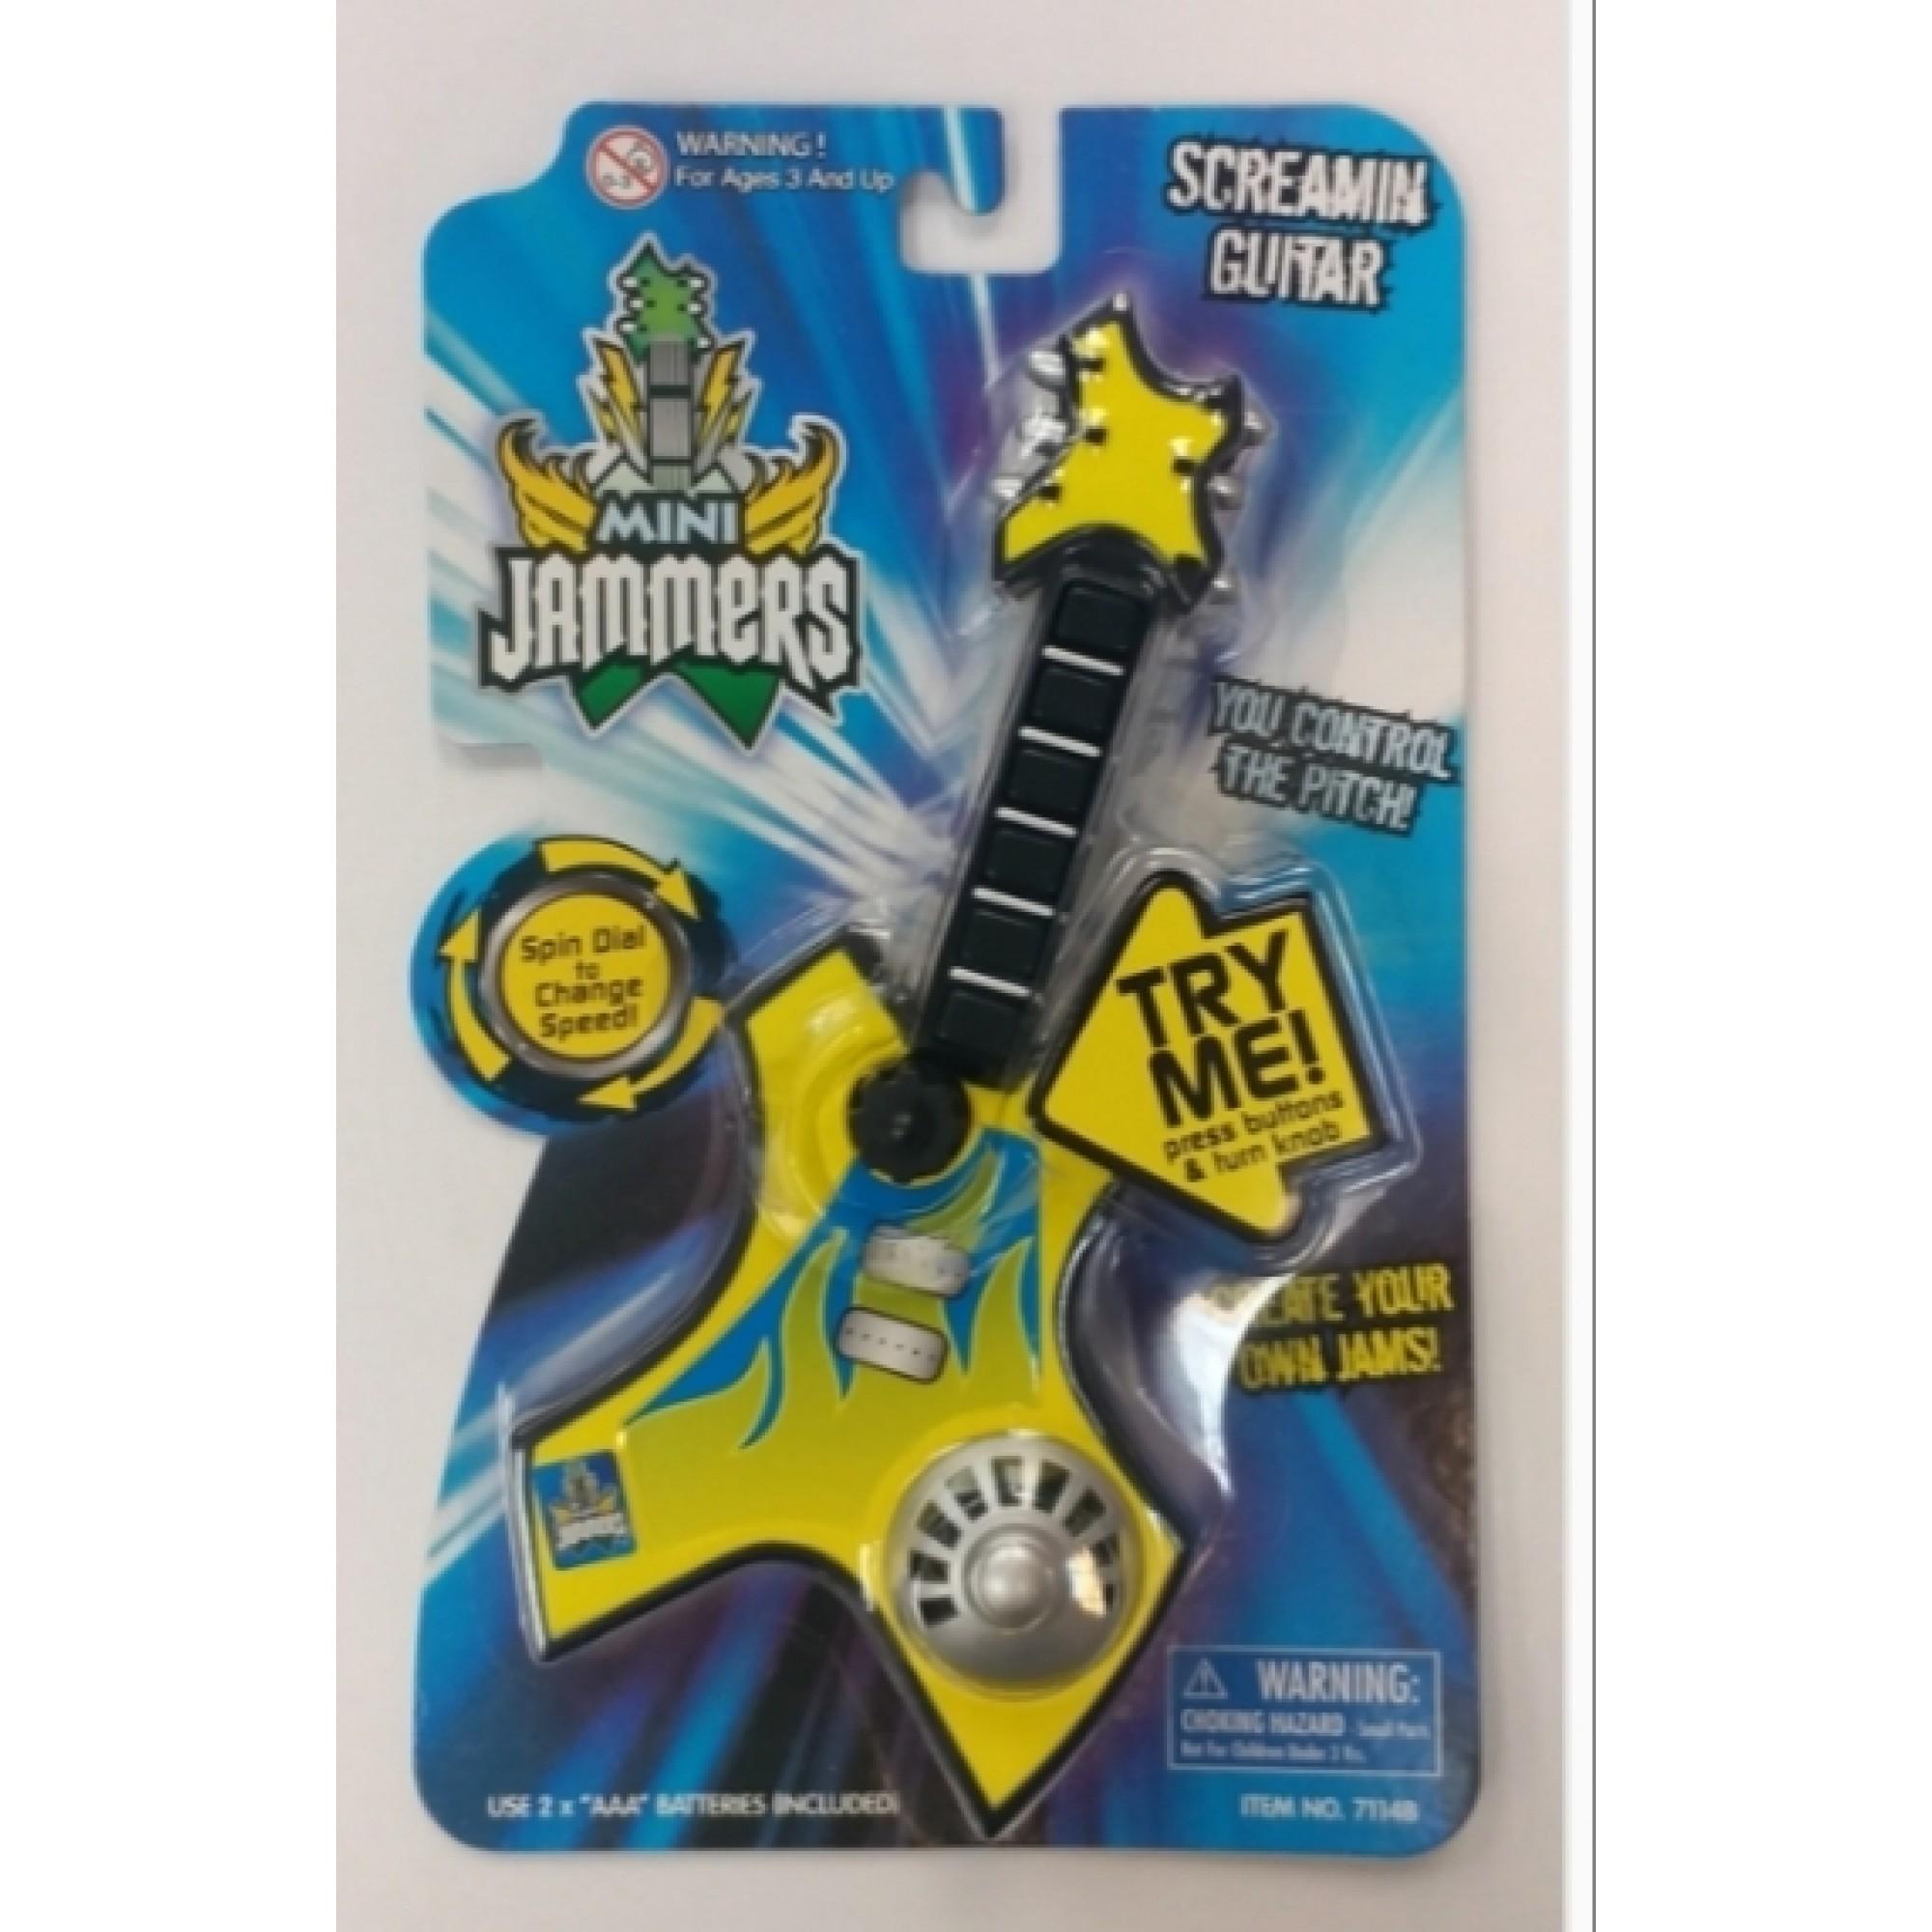 Mini Jammers - Screamin Guitar